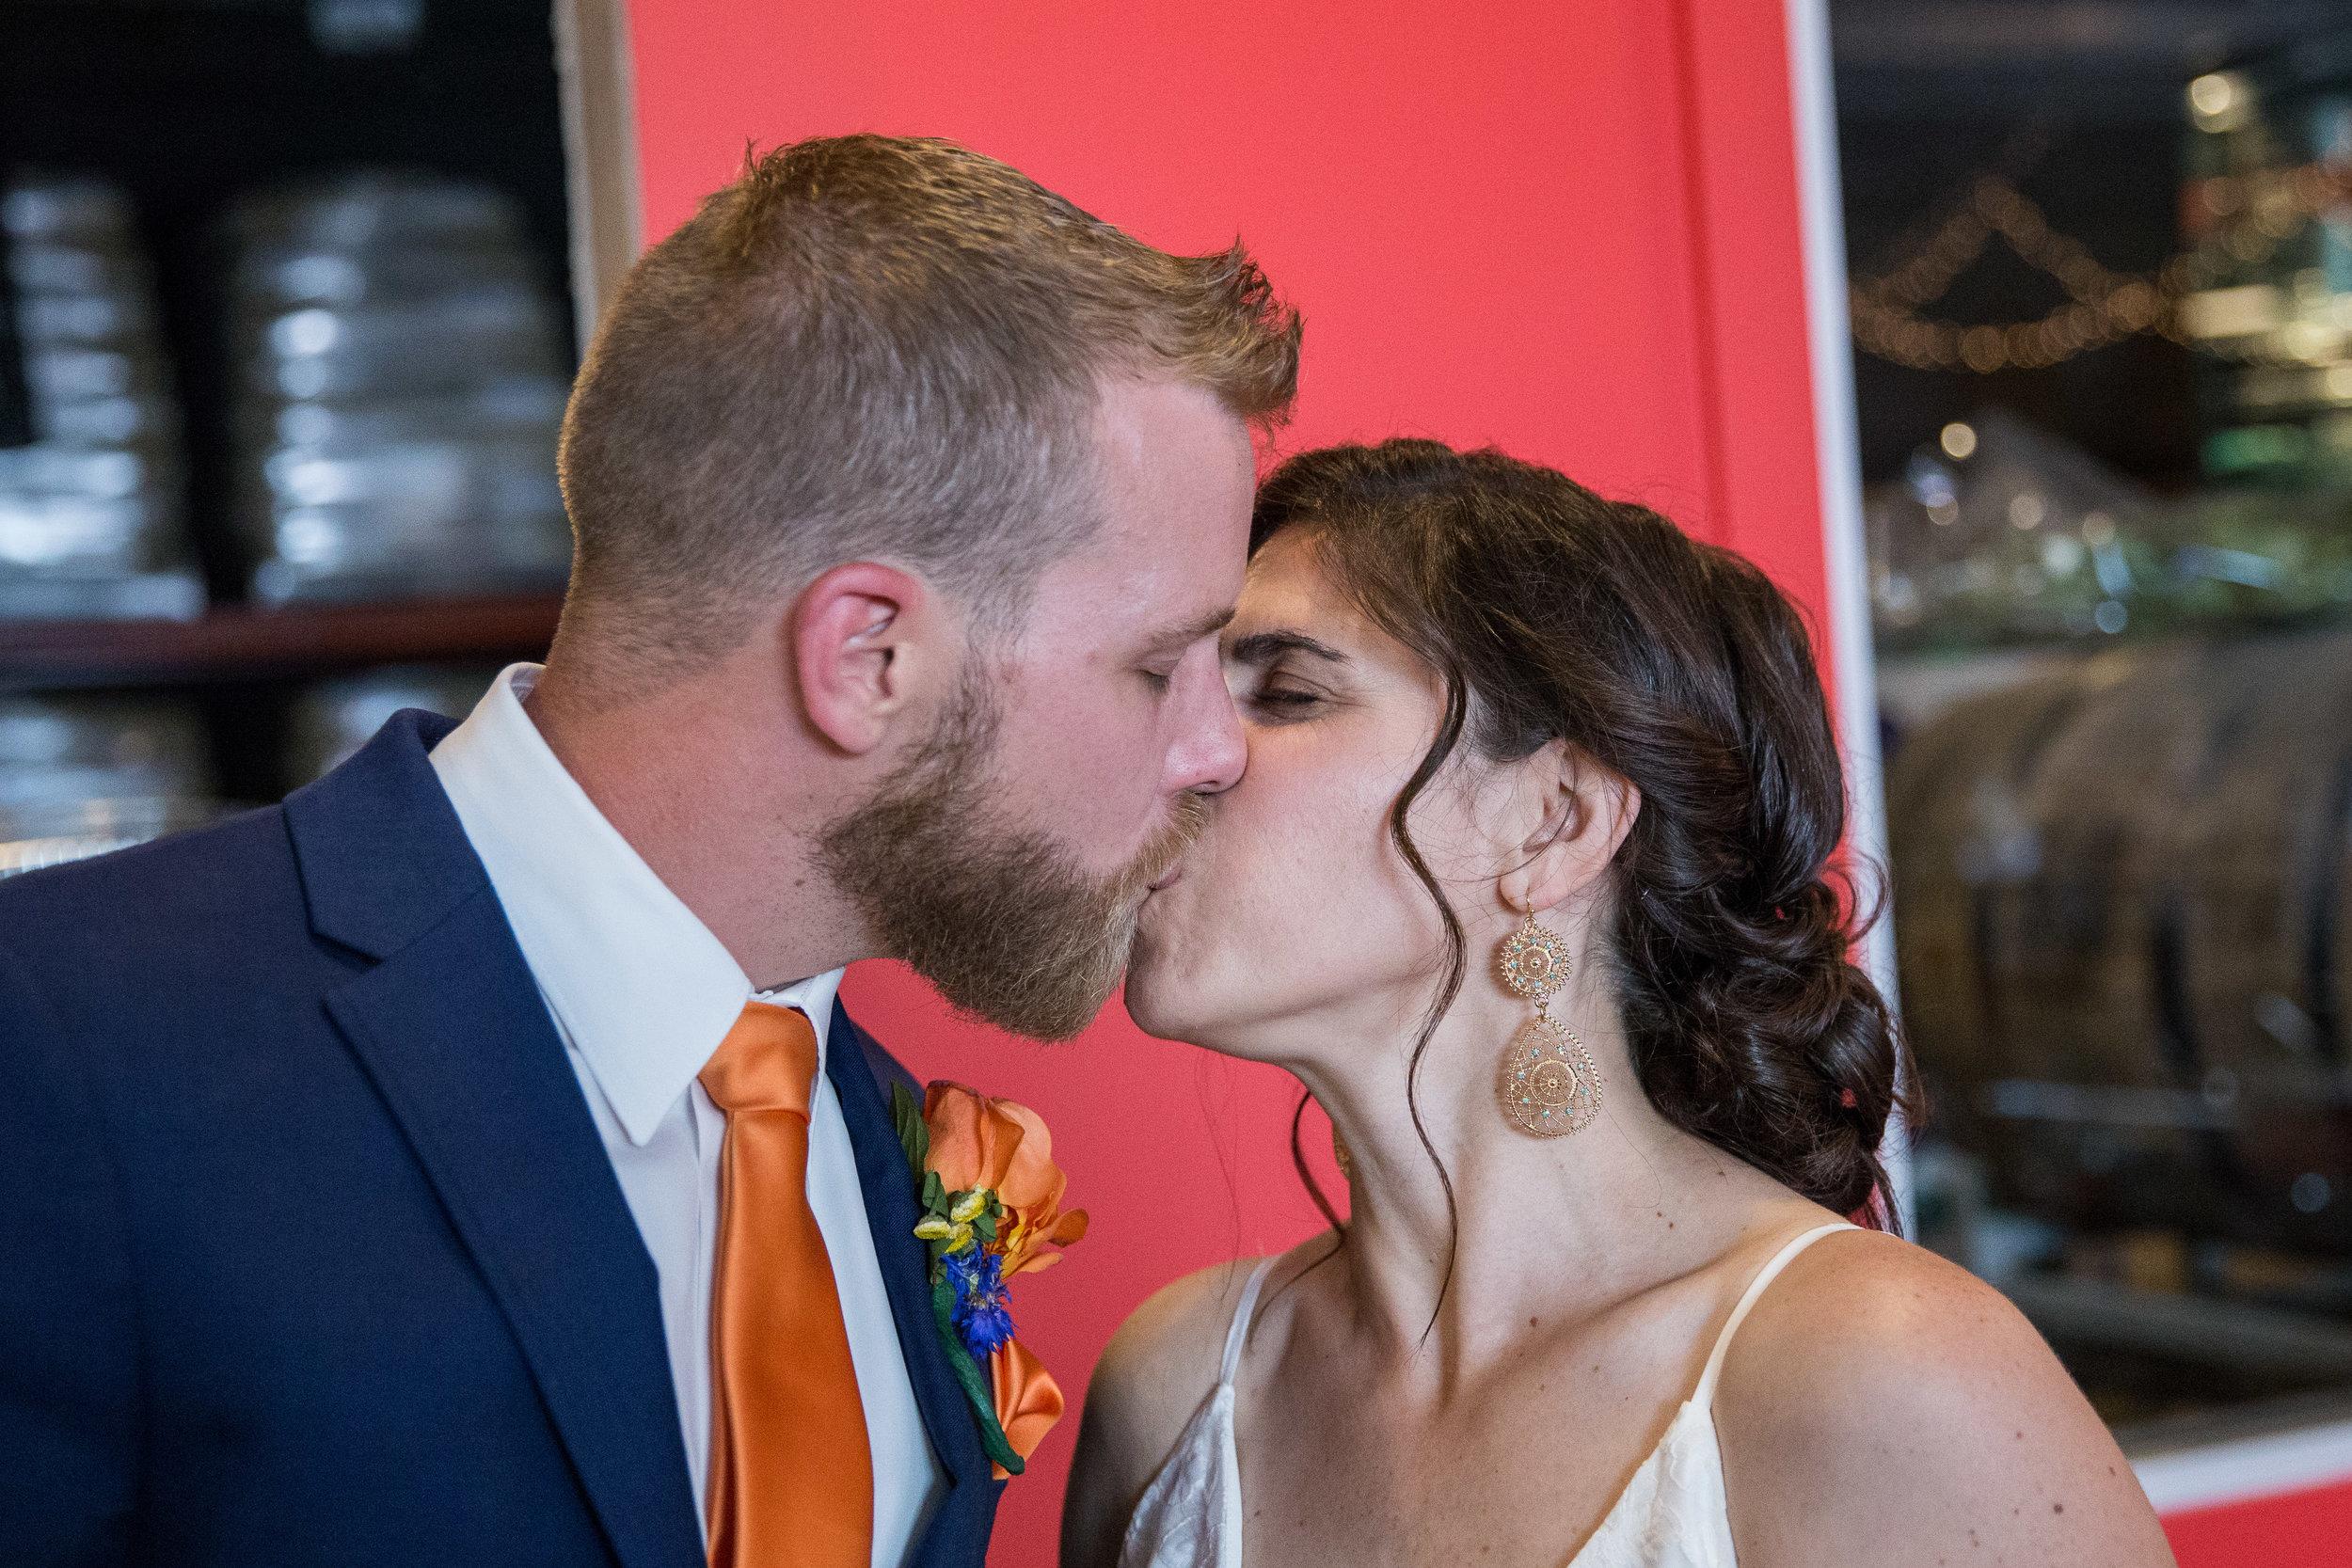 Natalie and Dallas Mooney Wedding 6-8-19_Tania Watt Photography-554.jpg